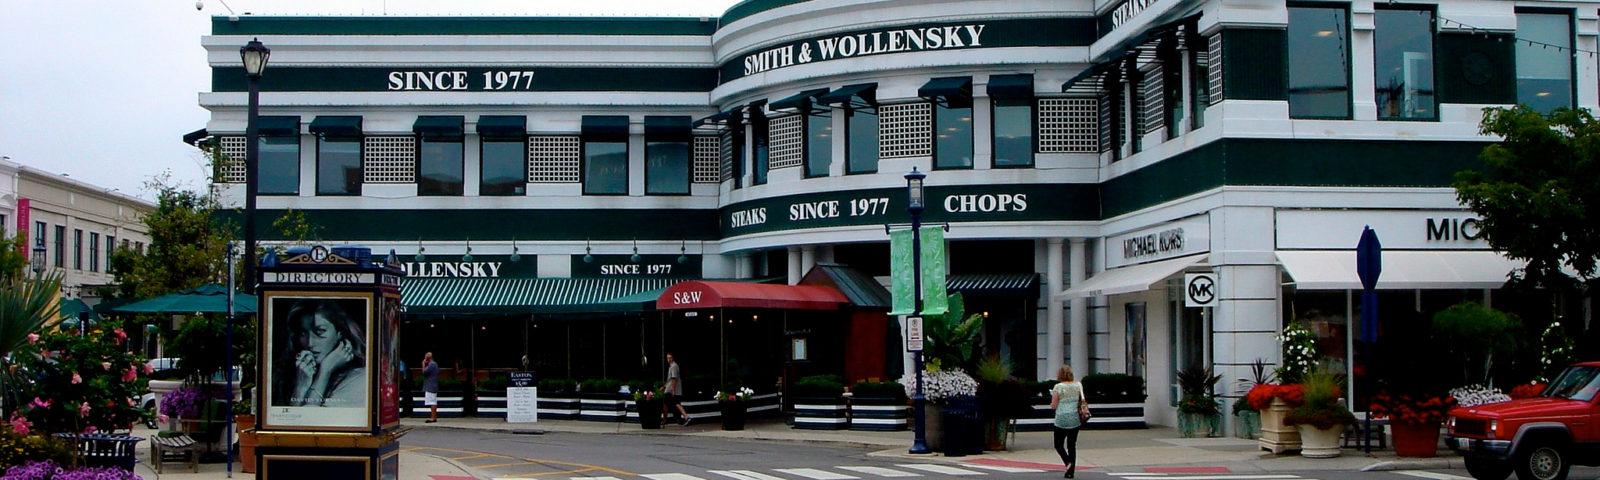 Favorite Romantic Restaurants in Columbus Ohio - Image by Bob Hall